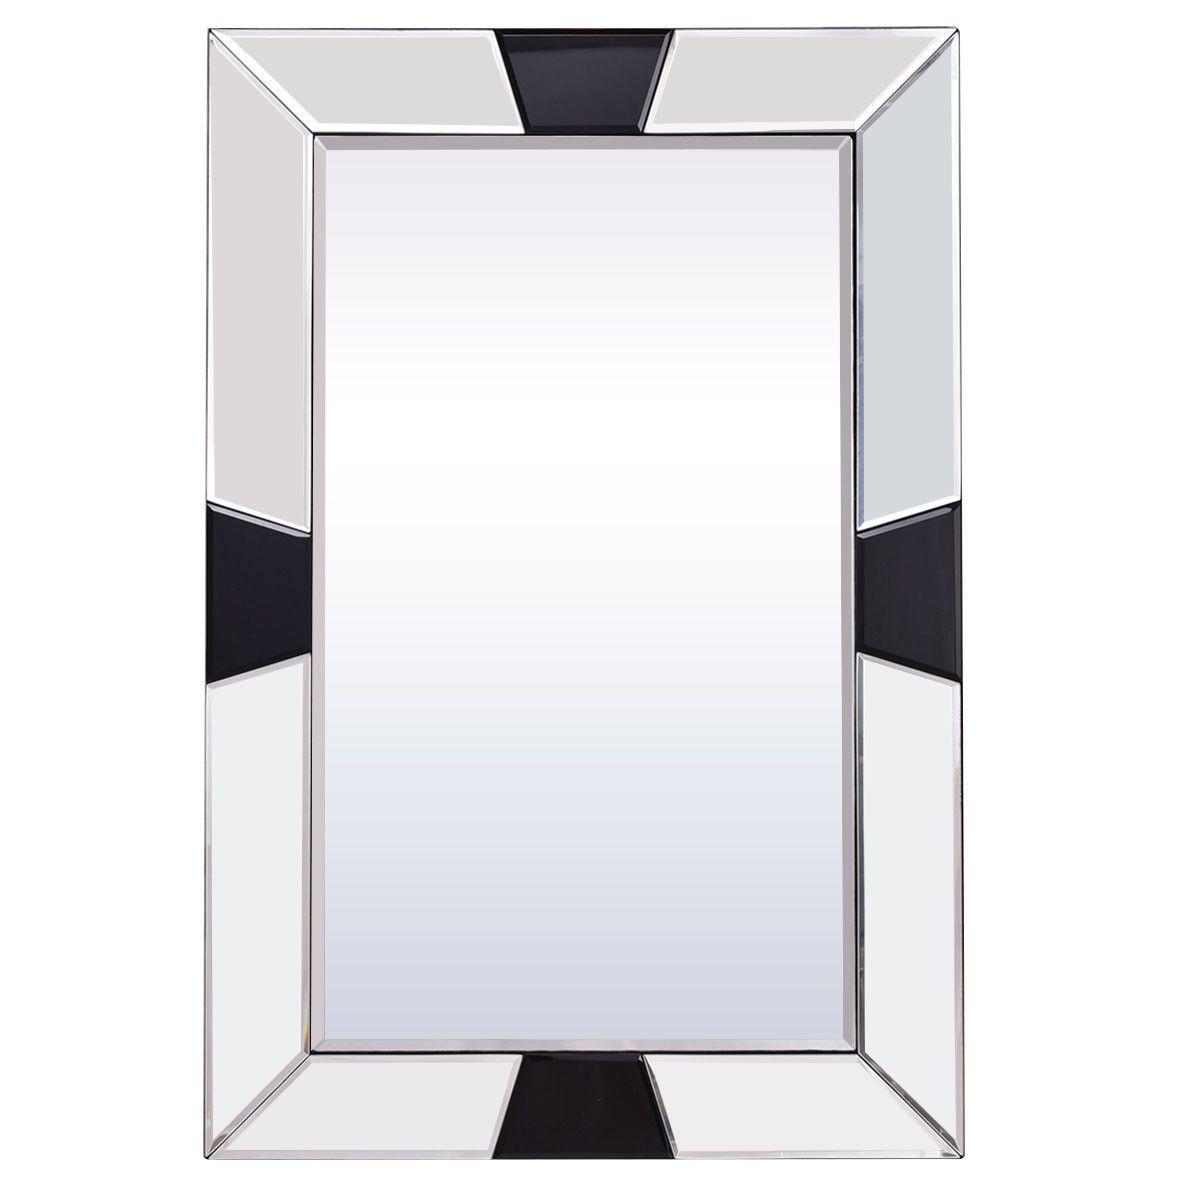 23 5 X 35 5 Rectangular Wall Mounted Wooden Frame Bathroom Mirror Mirror Wall Bathroom Wood Framed Mirror Mirror Wall [ 1200 x 1200 Pixel ]